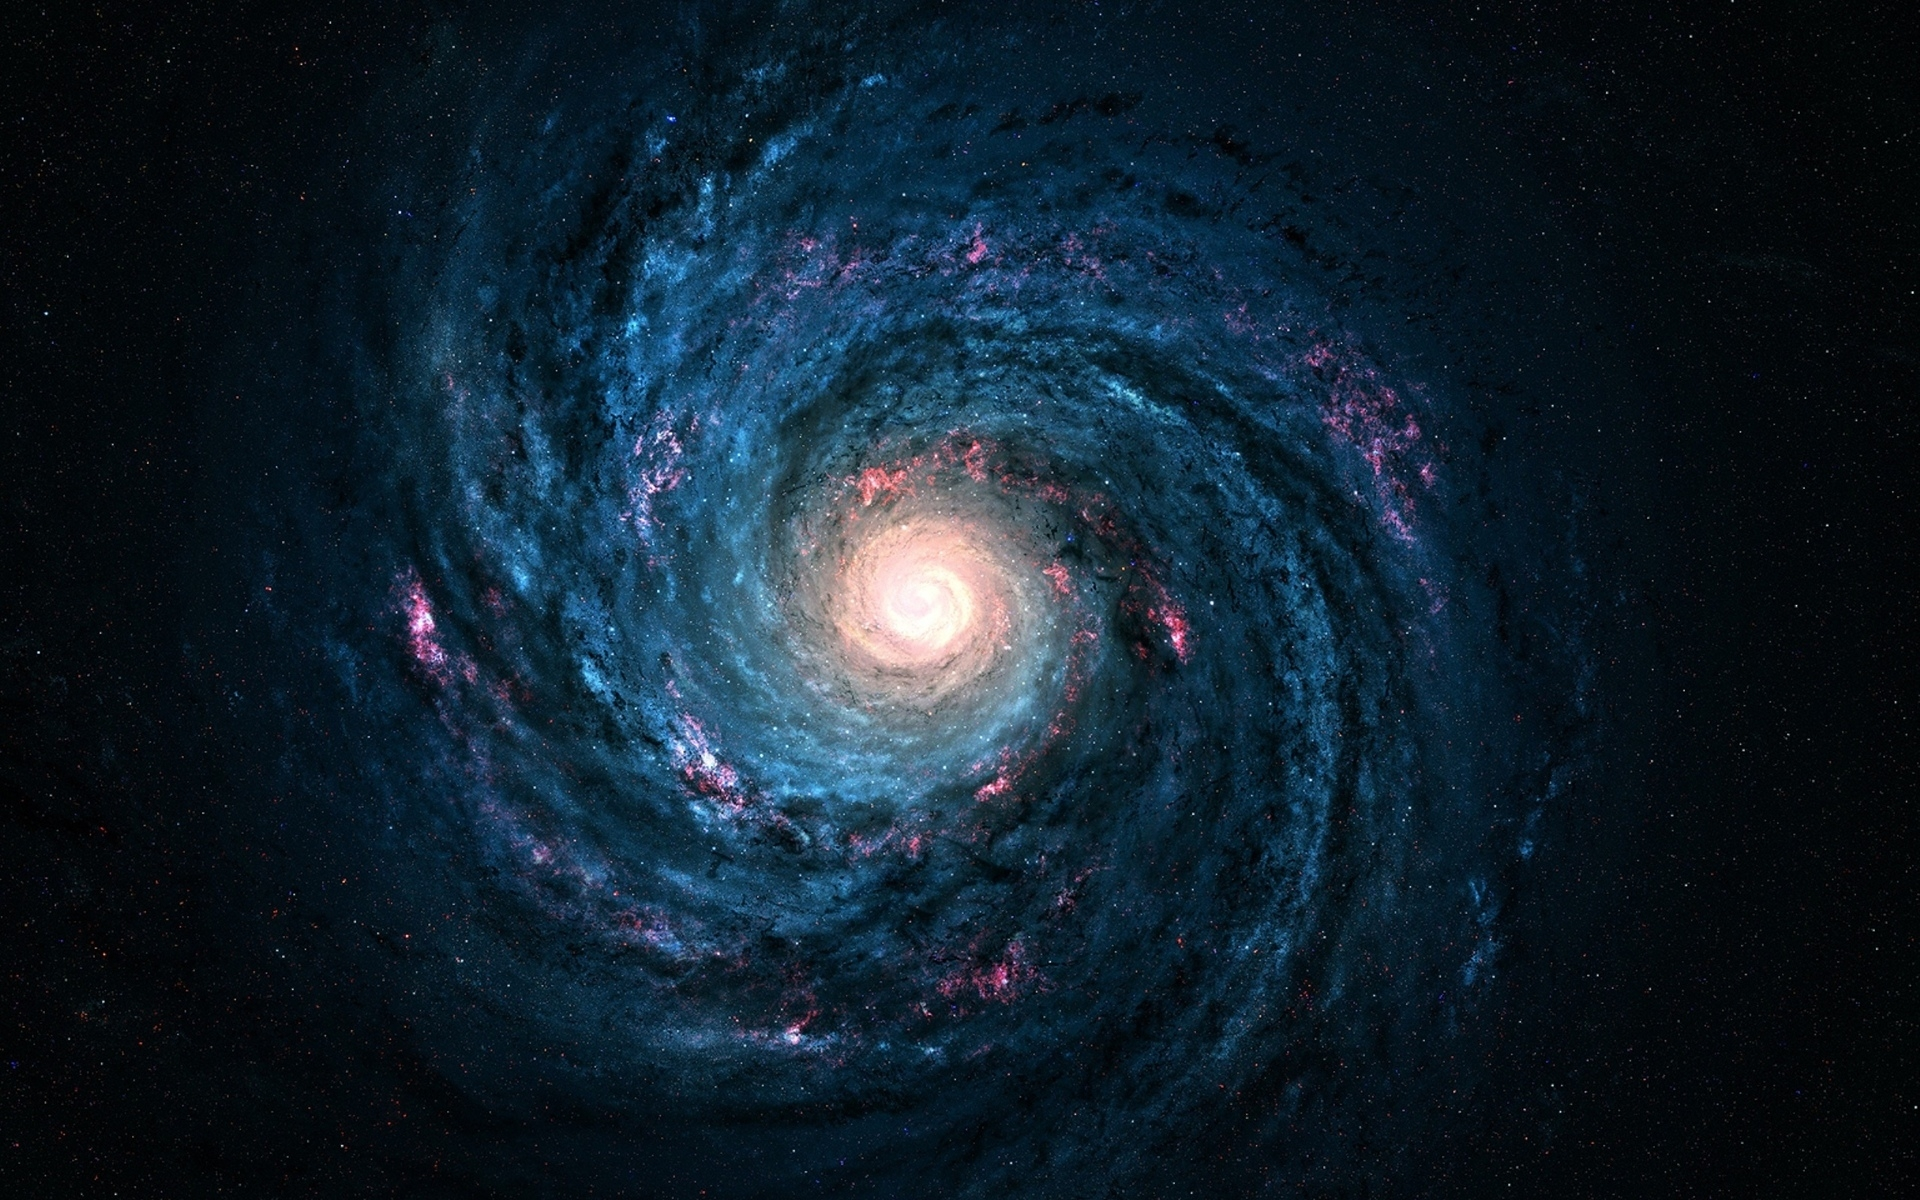 Earth At Night 3d Live Wallpaper Milky Way Galaxy Wallpapers Free Download Pixelstalk Net